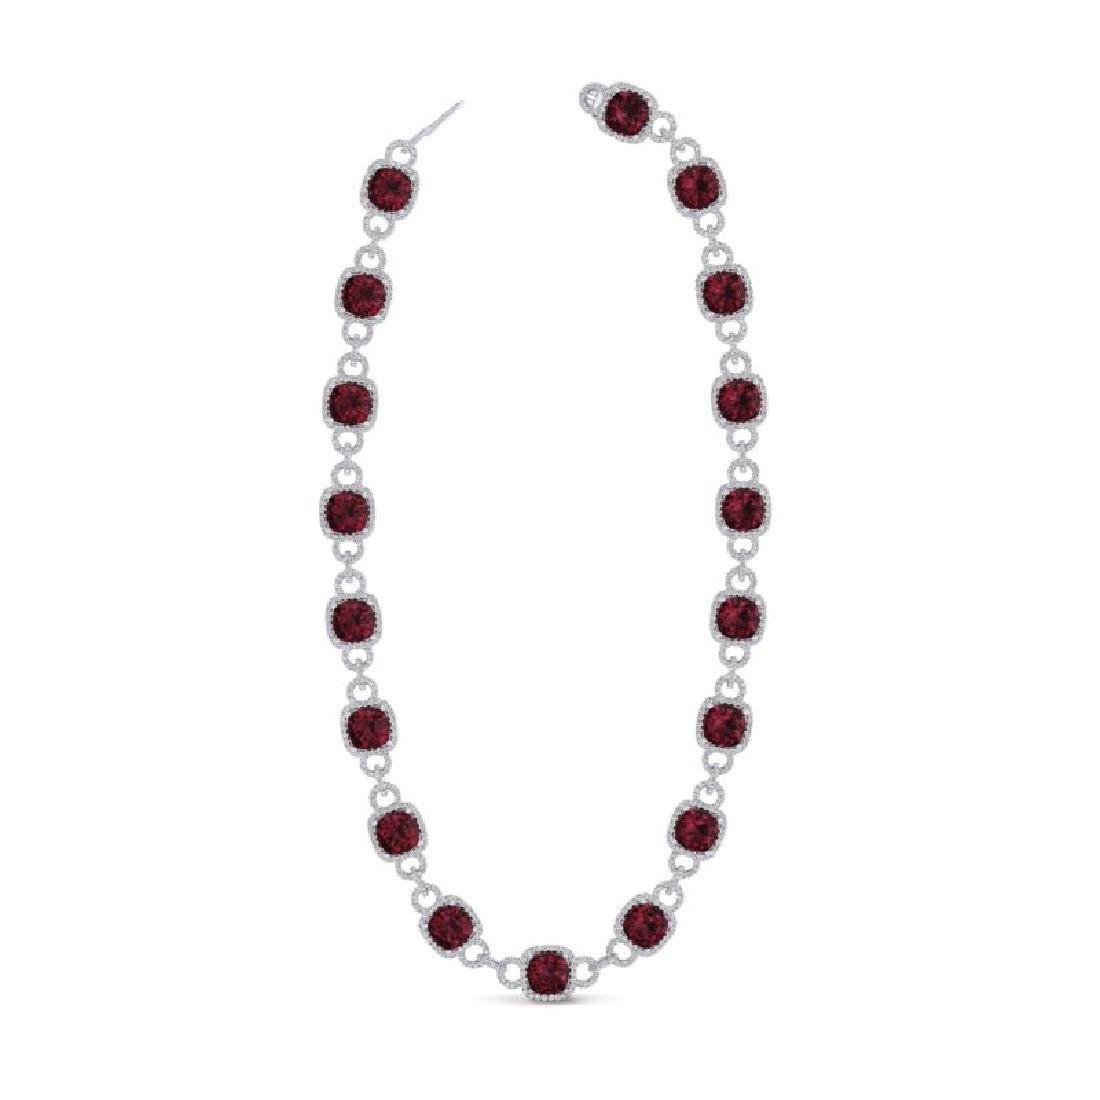 66 CTW Garnet & VS/SI Diamond Necklace 14K White Gold - 2